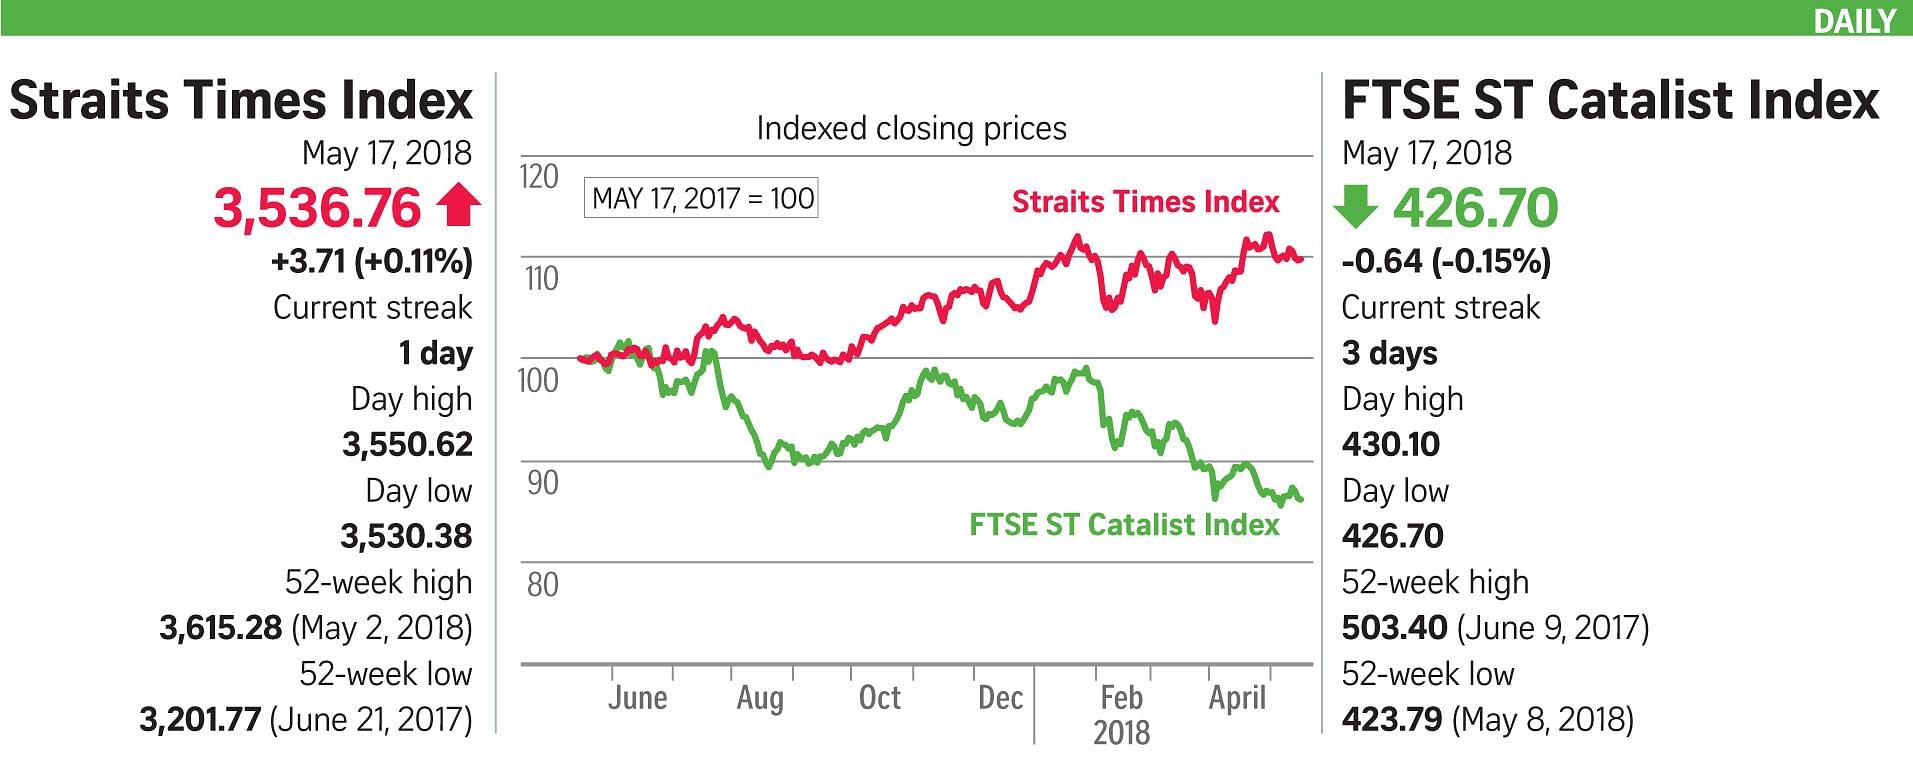 Geopolitics Rising Us Bond Weigh On Sti Companies Markets News